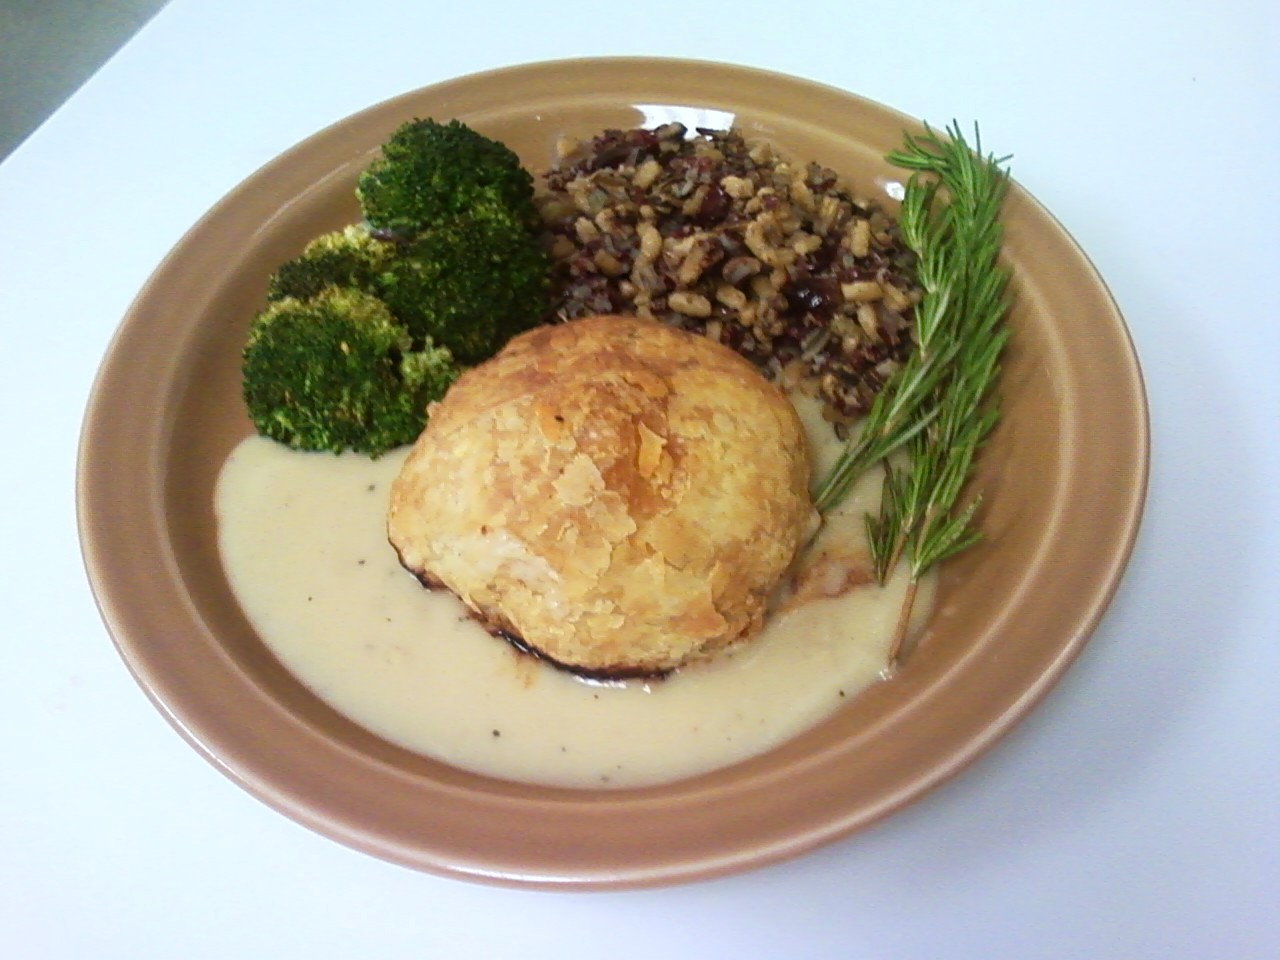 Professional Vegan Cooking and More: Portobello Mushroom ...